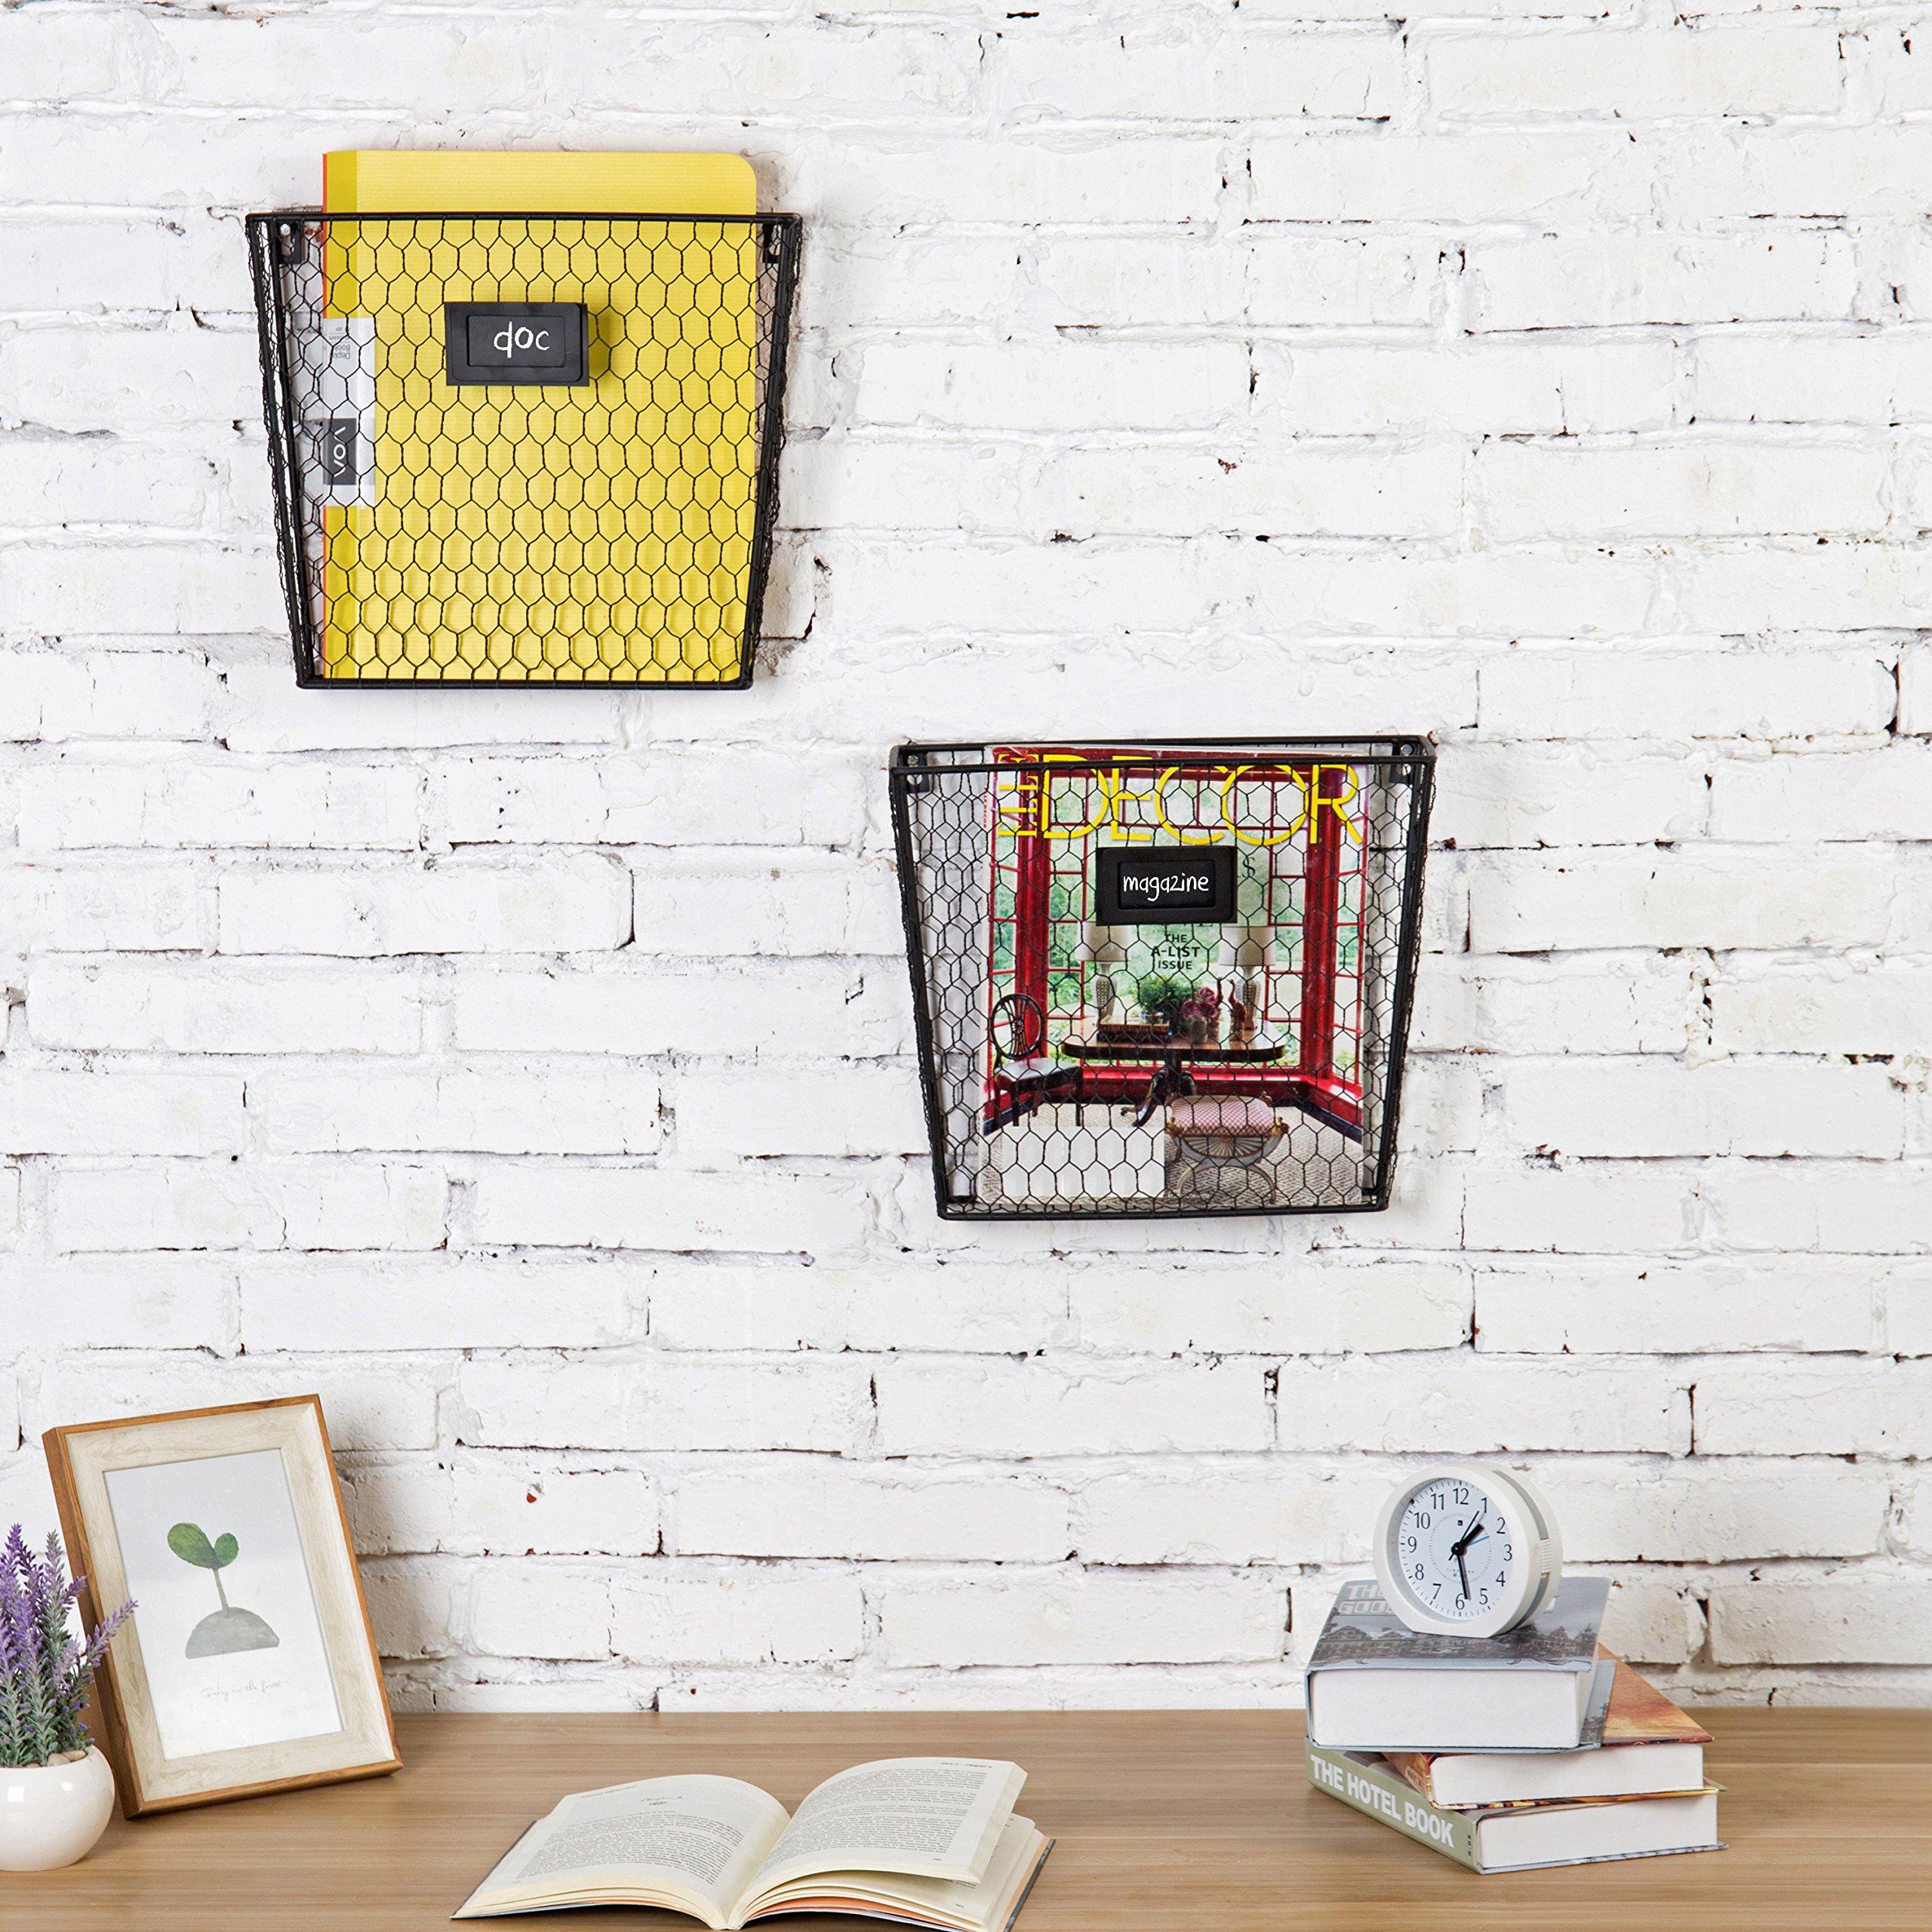 MyGift Rustic Chicken Wire Wall-Mounted Magazine & File Folder Baskets w/Chalkboard Label Inserts, Set of 2 by MyGift (Image #5)